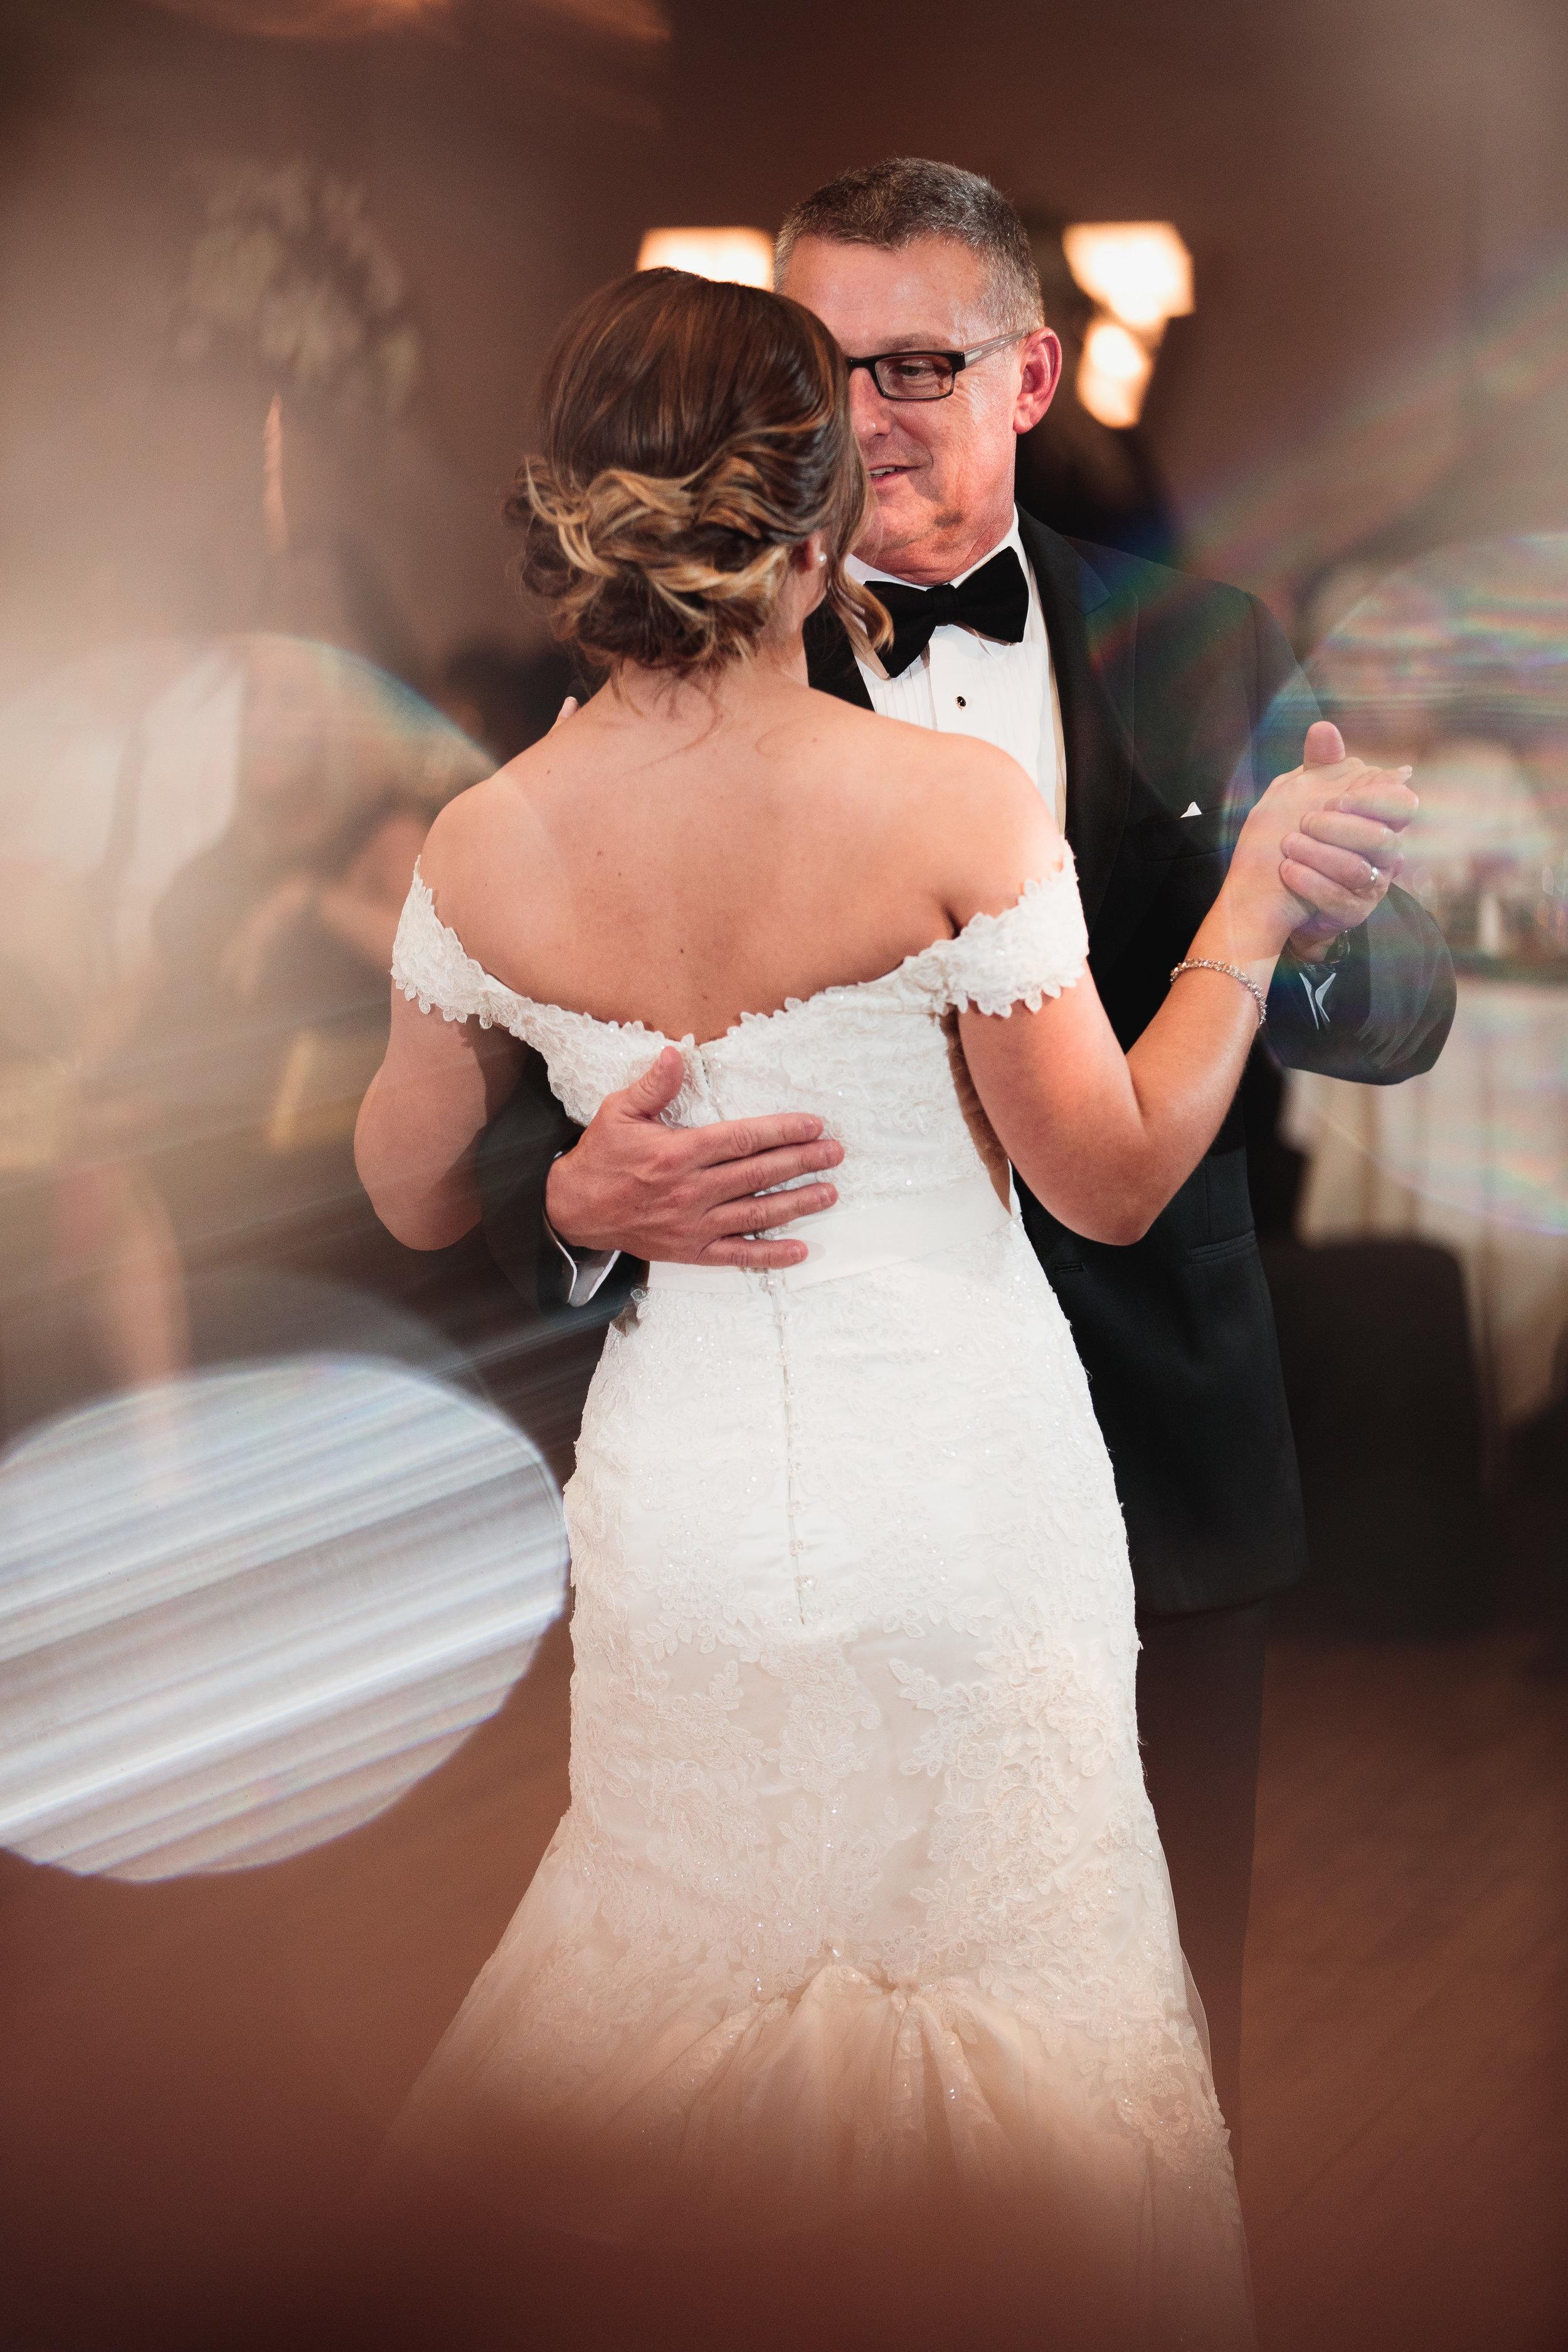 Robb McCormick Photography Blog 4.11.17 (97 of 100).jpg